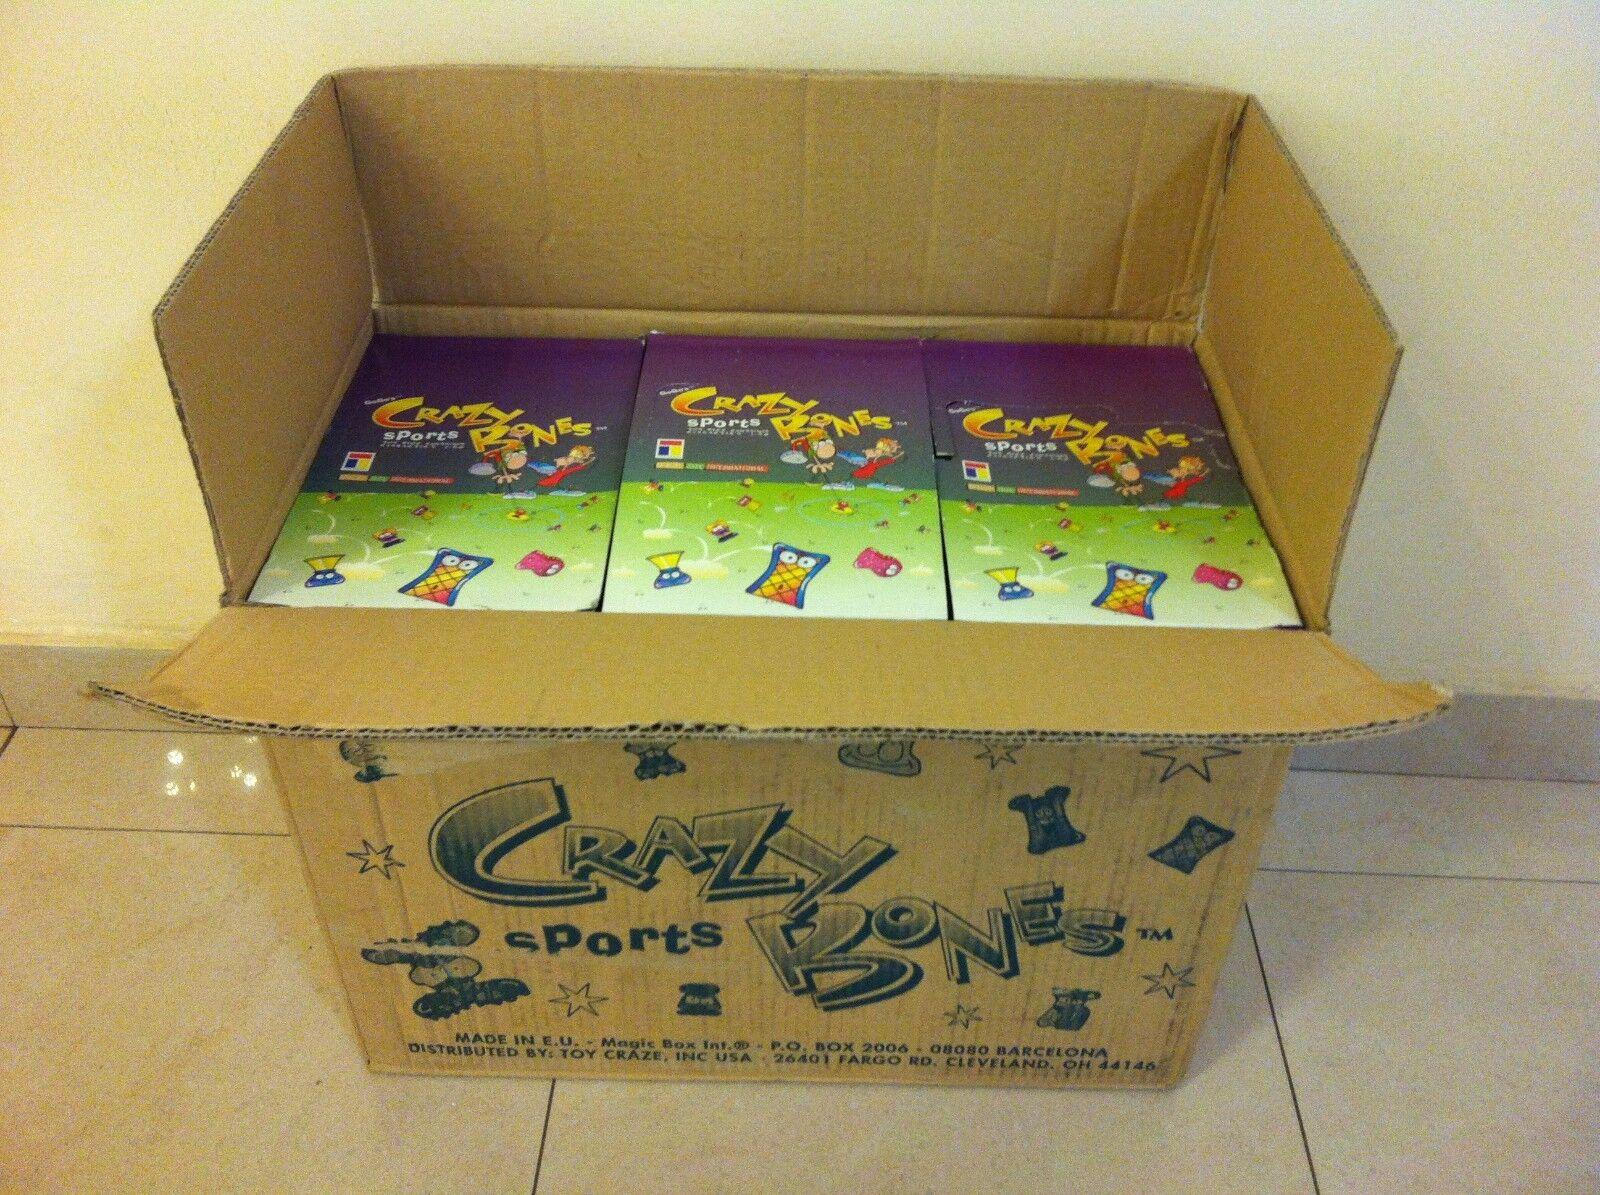 GOGOS CRAZY BONES SPORTS BOX LOT OF 9 BOXS